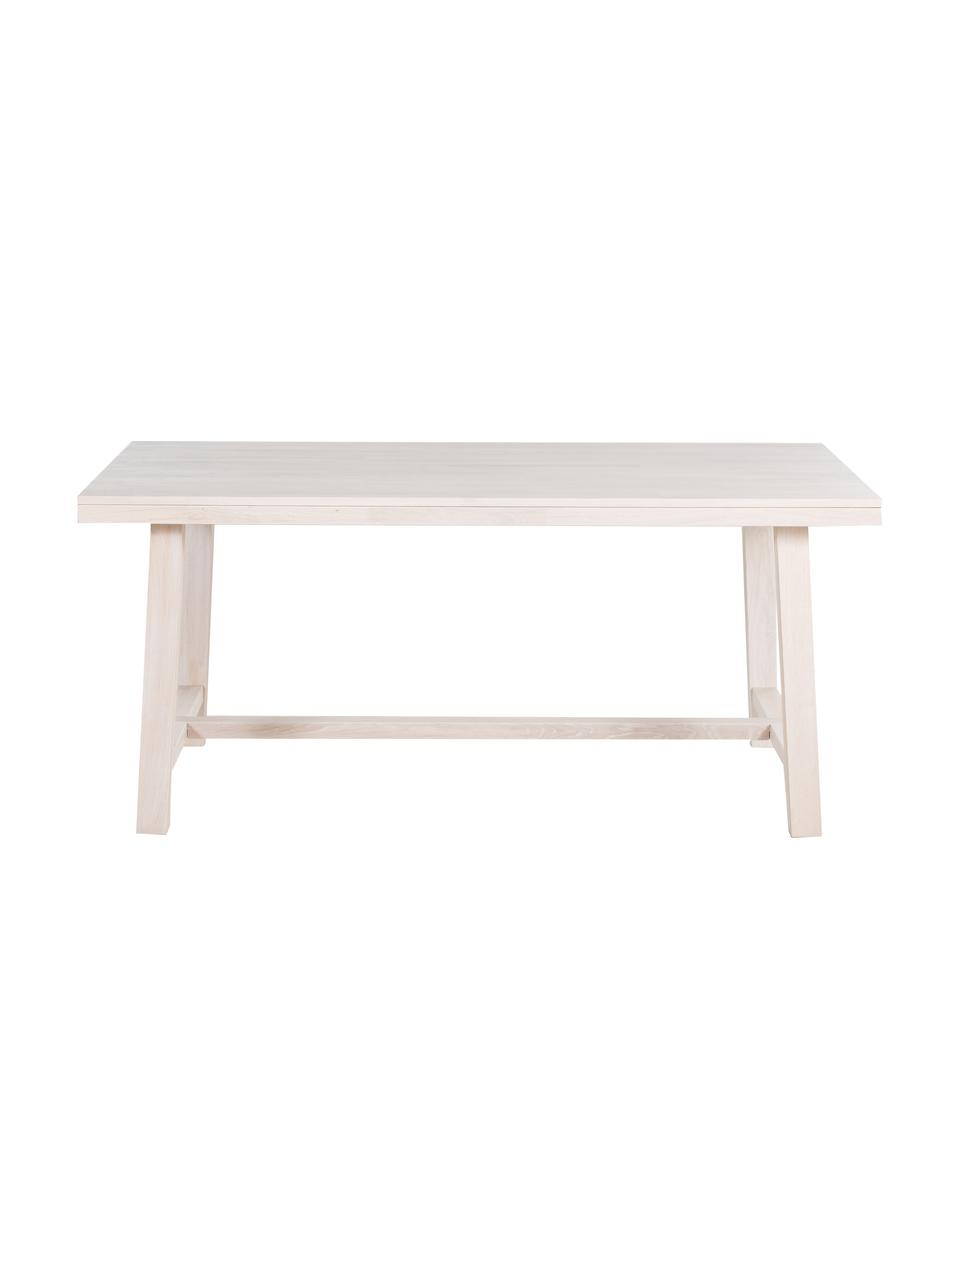 Table extensible en chêne massifBrooklyn, 170 - 220 x 95 cm, Bois de chêne, blanc délavé